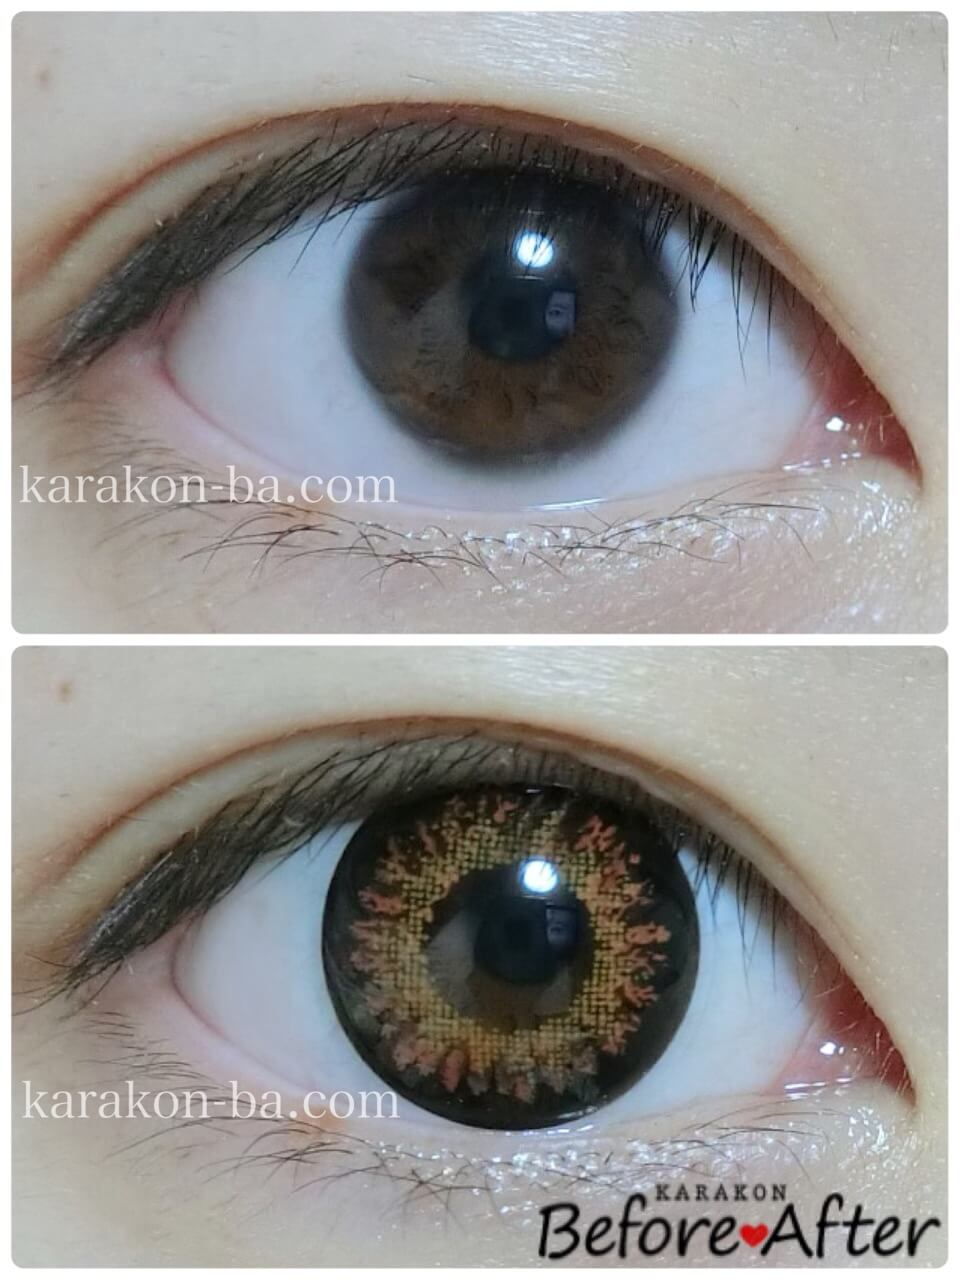 VICTORIA GARDEN(ビクトリアガーデン)チョコレートのカラコン装着画像/裸眼と比較レポ